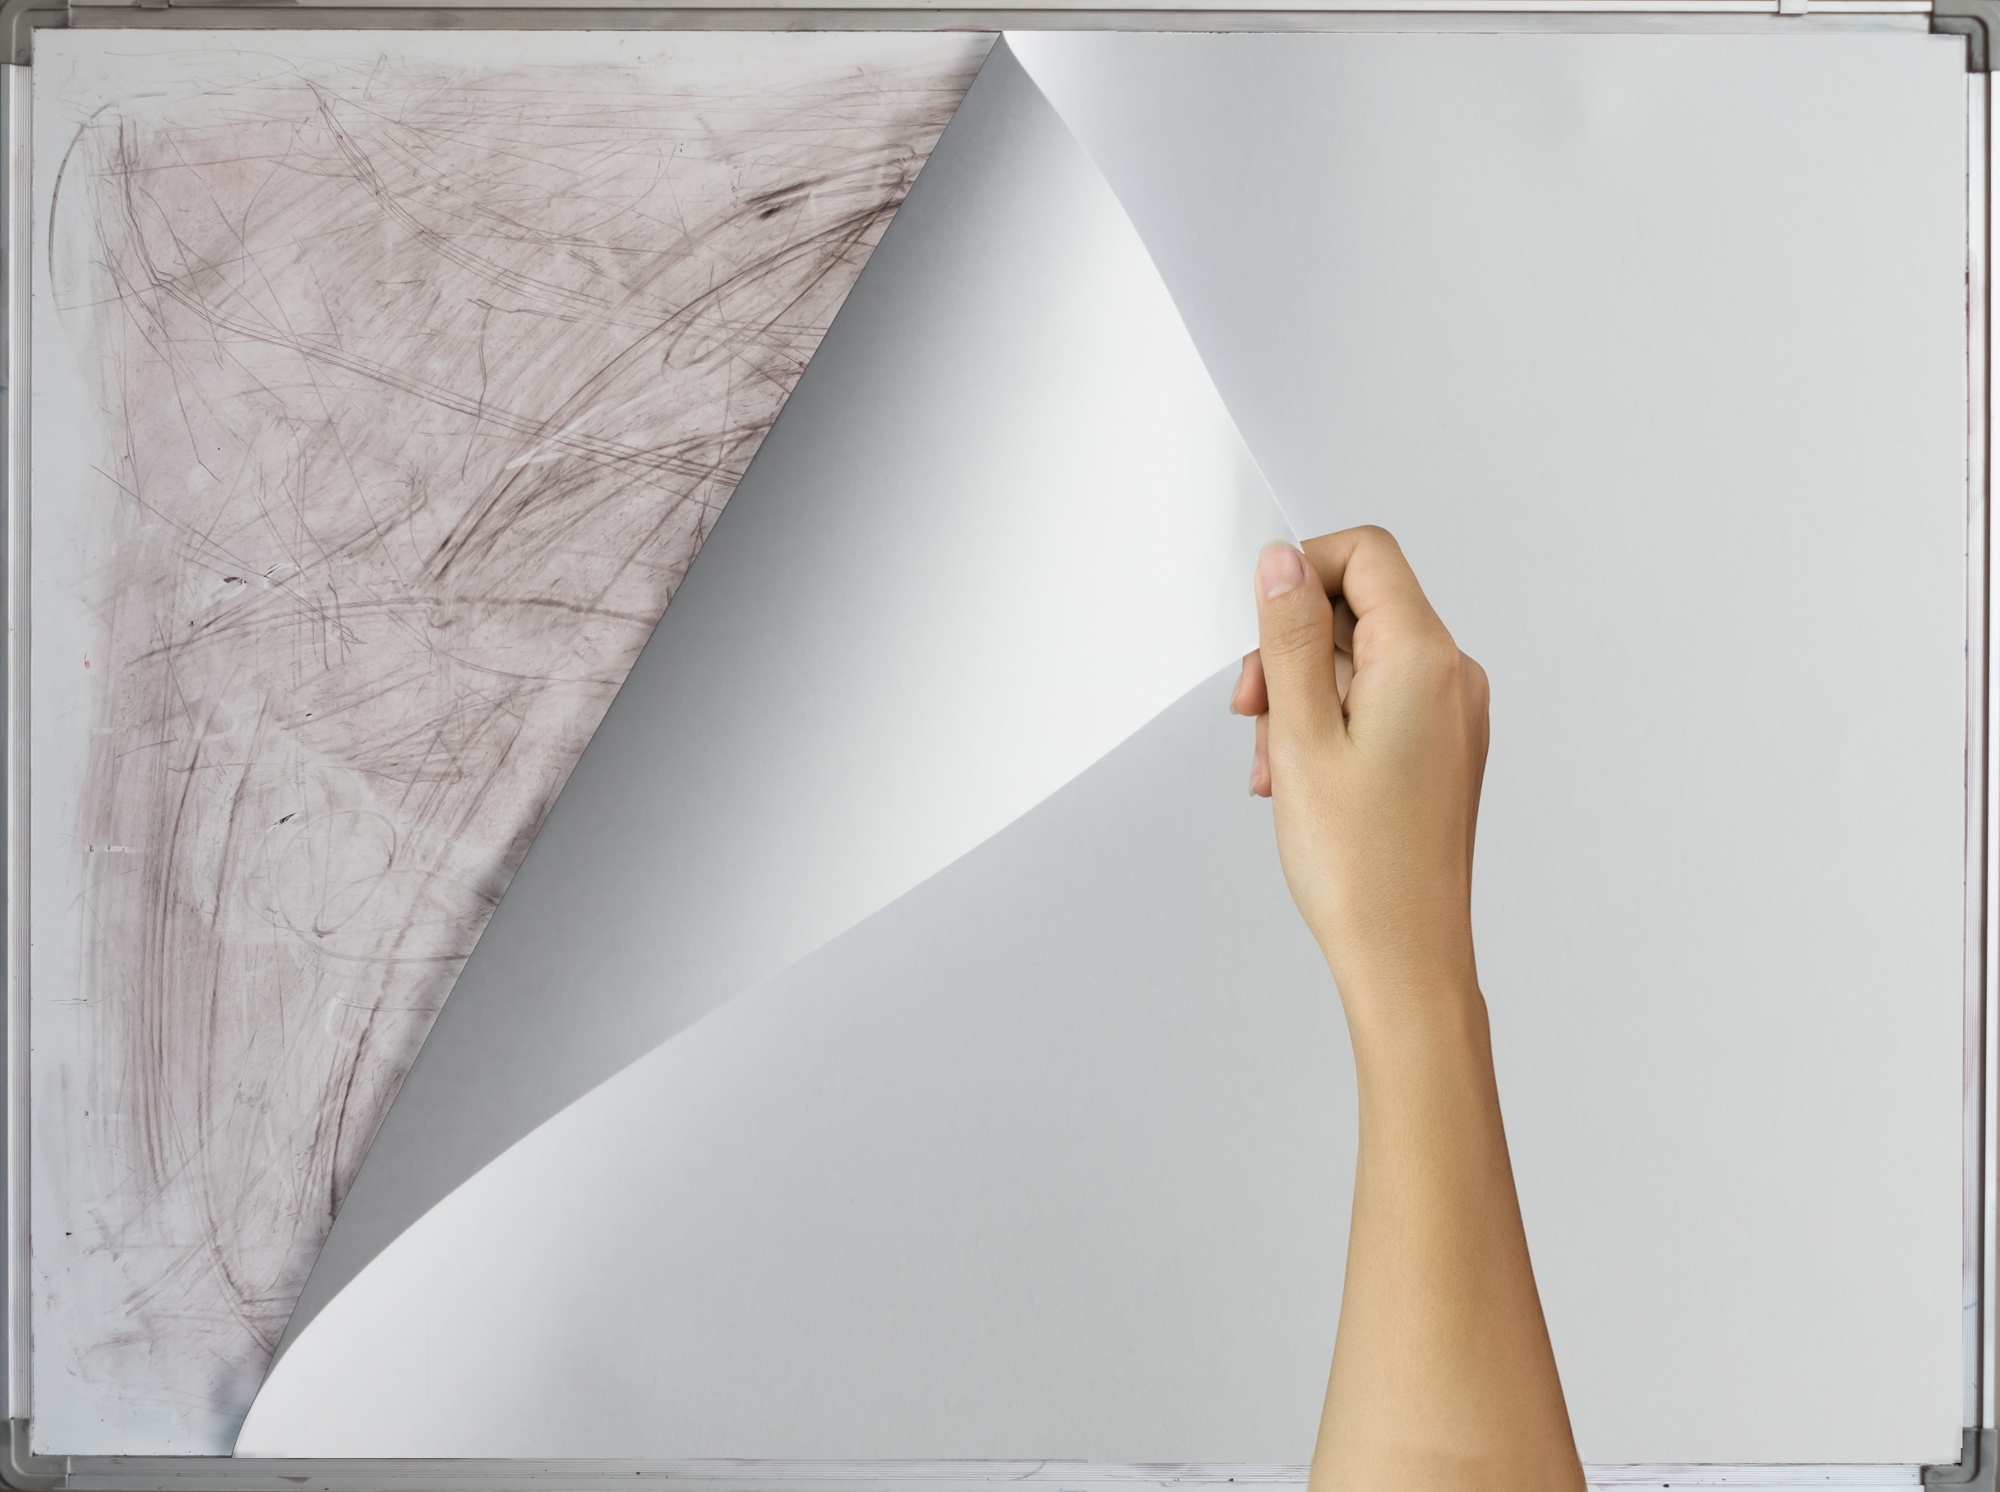 Dry Erase Film by Drytac